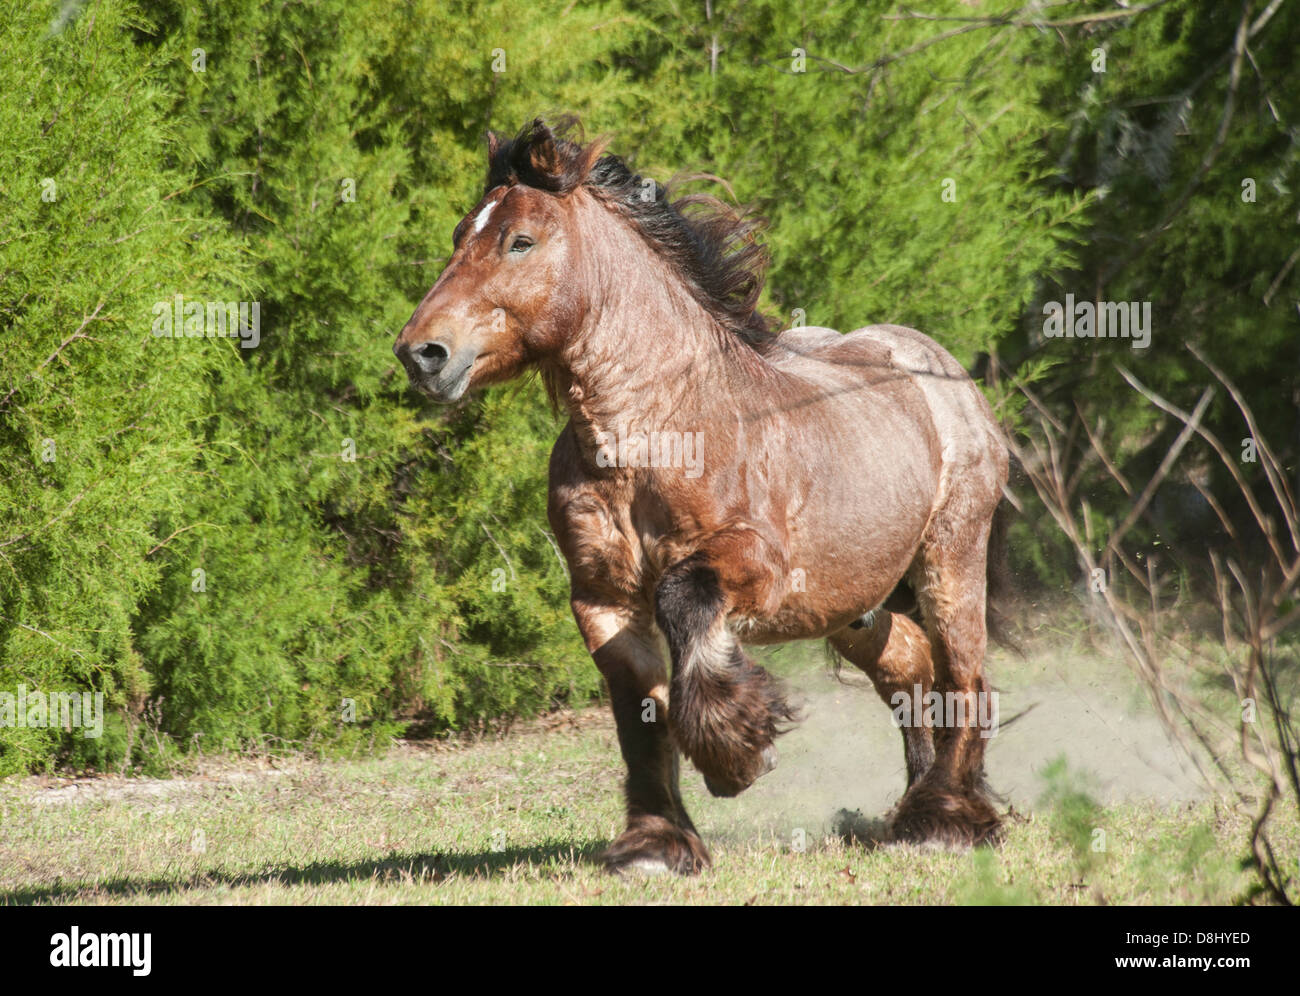 Ardennes Draft Horse stallion - Stock Image